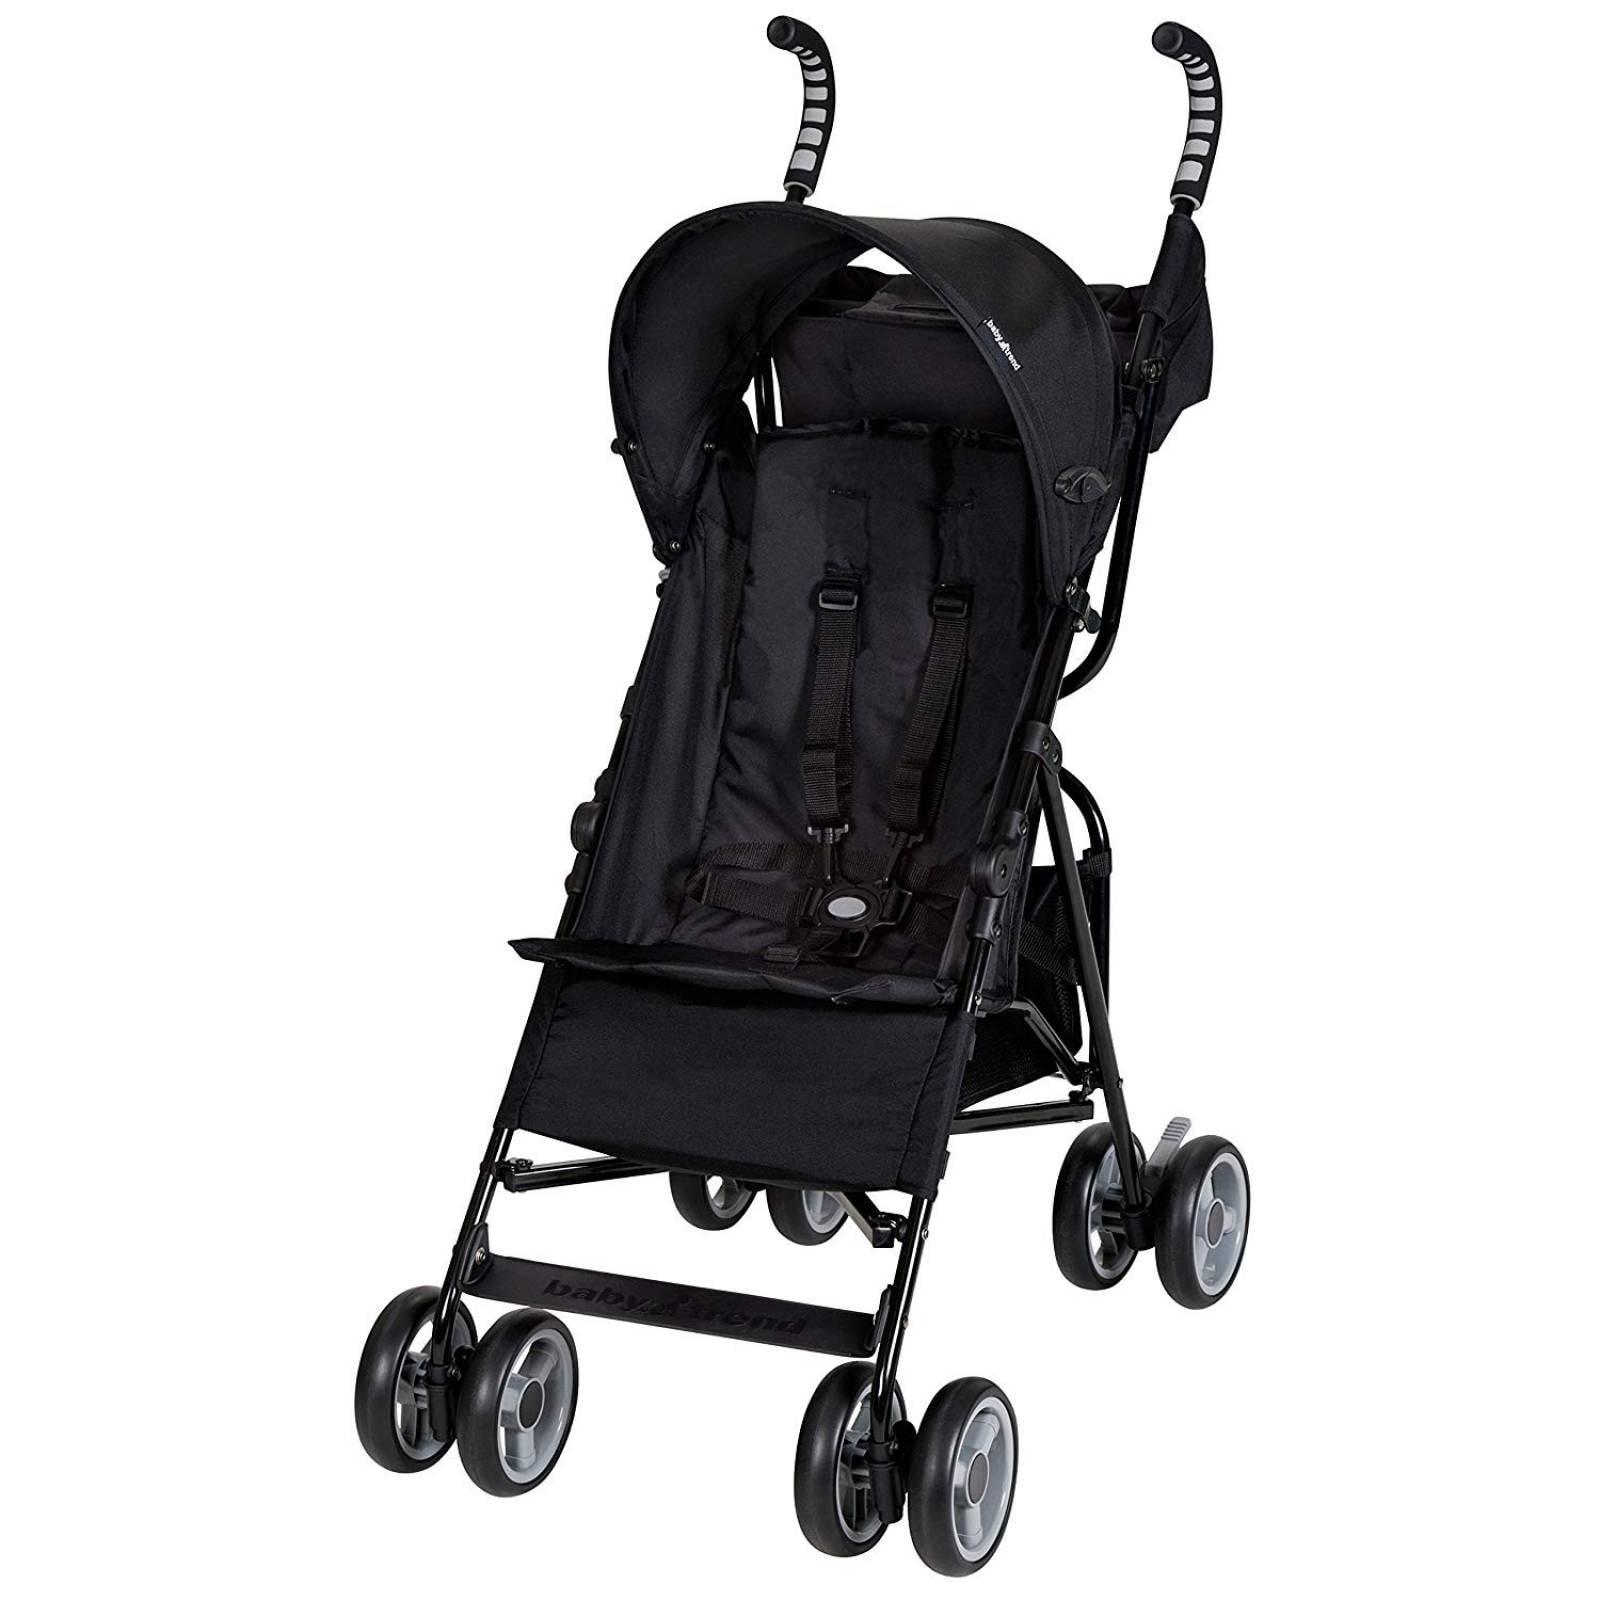 Carriola Ligera Plegable Baby Trend -Negro